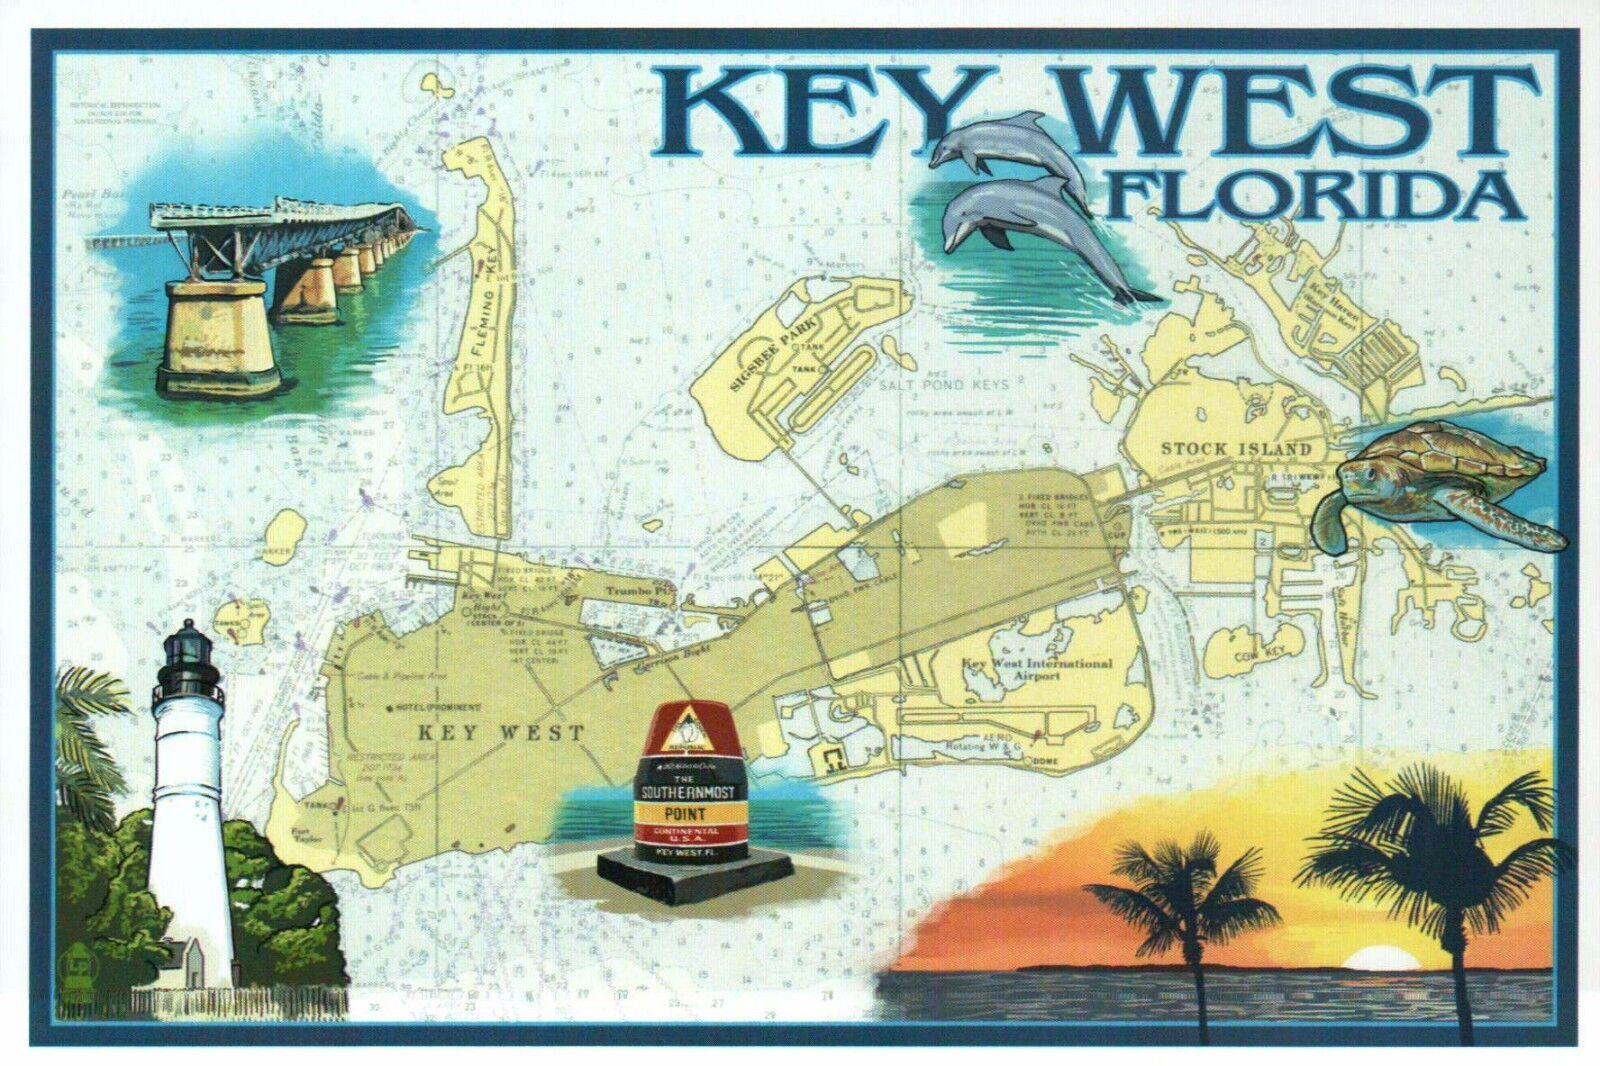 Image 1 - Key West Nautical Chart, Florida, Map, Lighthouse, FL Keys Bridge etc - Postcard